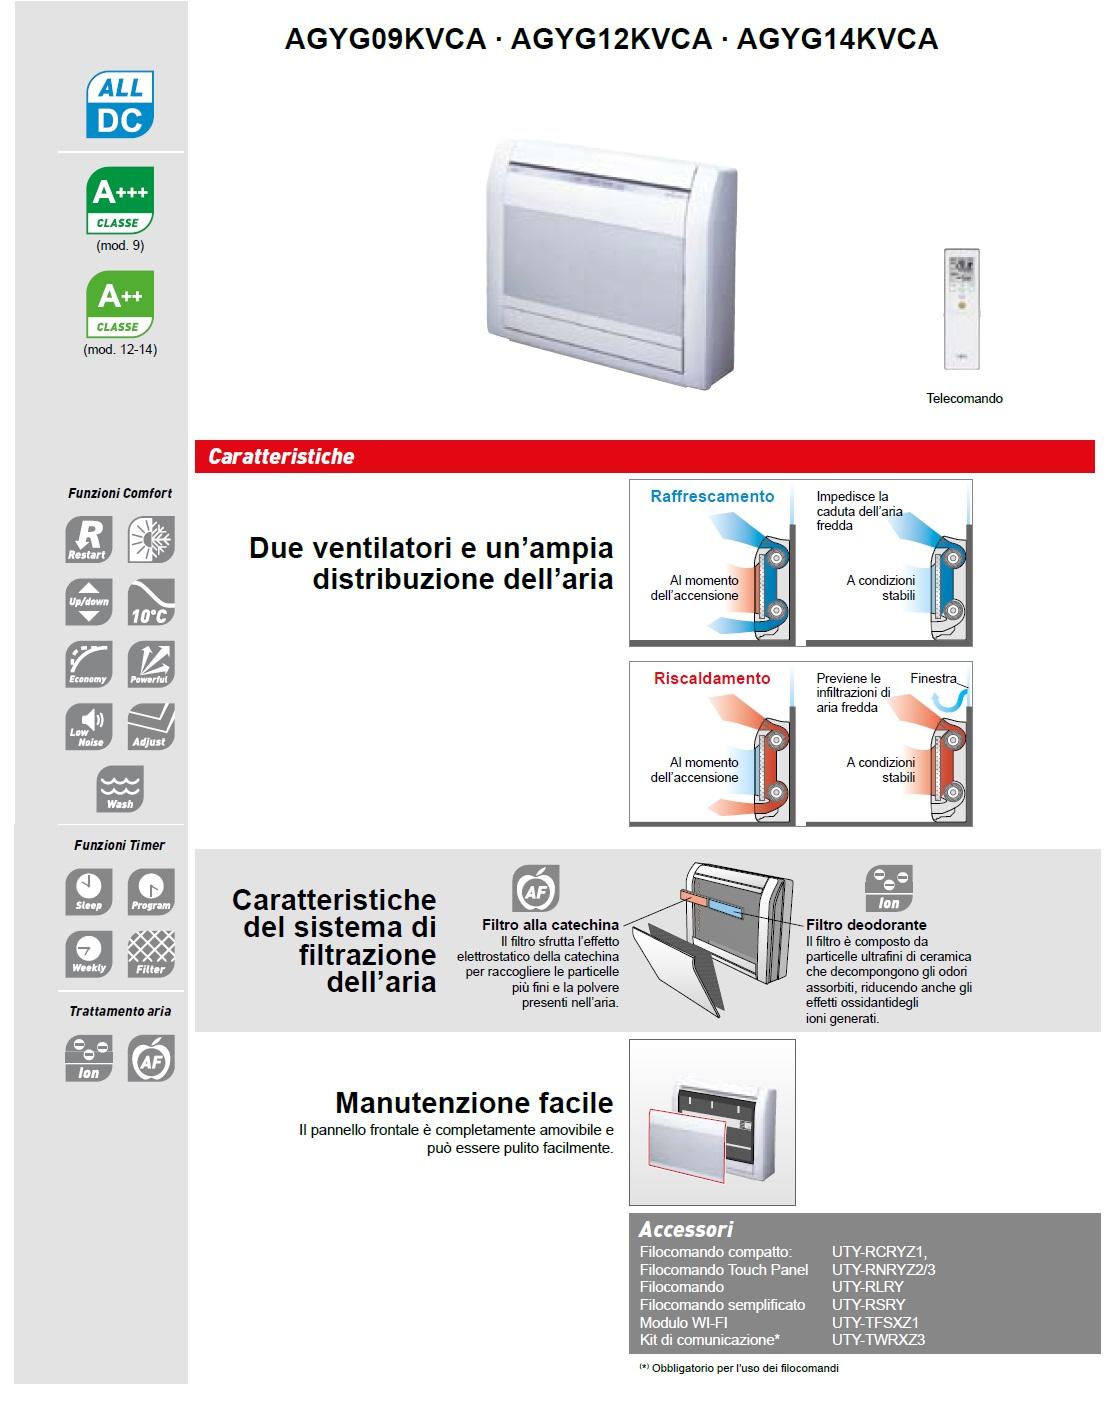 Klimageräte Fujitsu Mono Split 15000 Btu AGYG14KVCA AOYG14KVCA